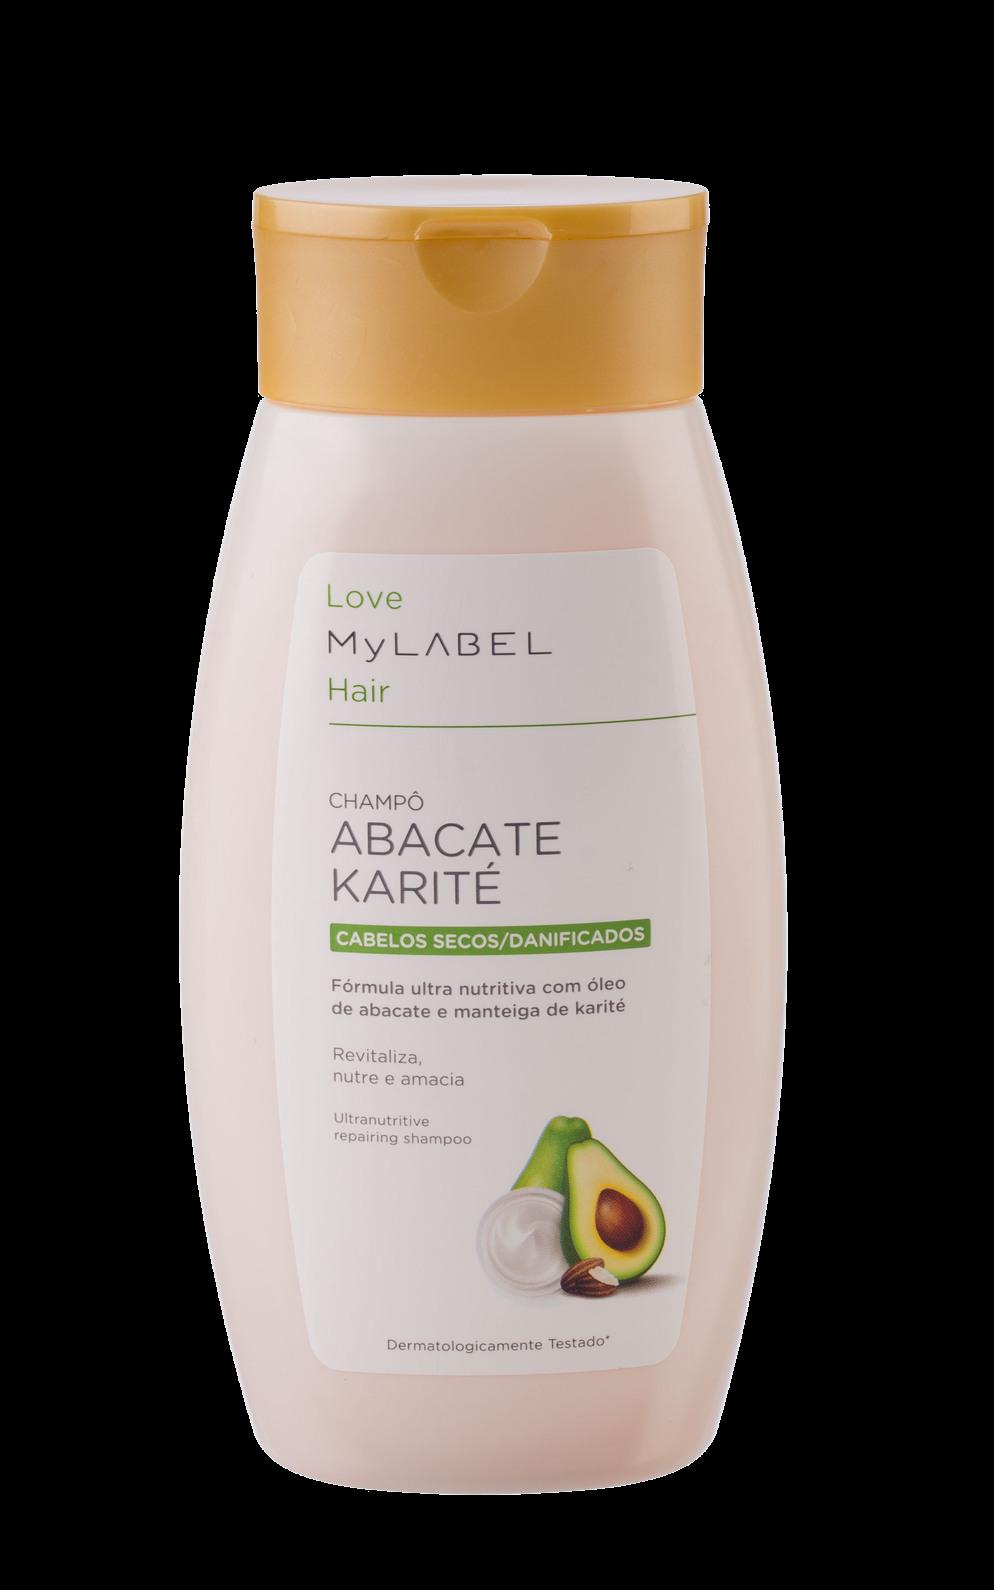 Champô Naturals Abacate/ Karité